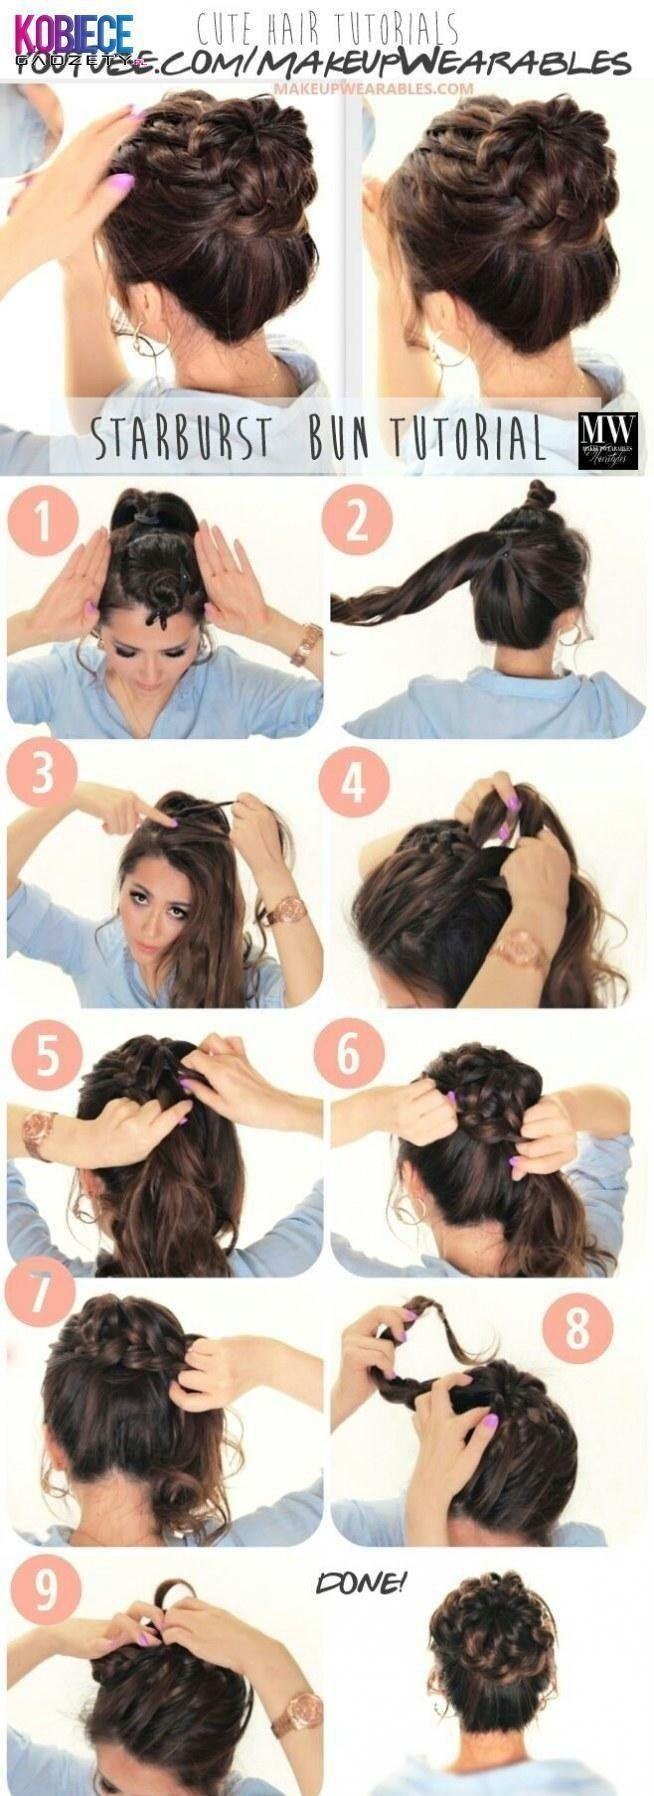 Bob beauty hairstyle hair braid hair styles topknot hair